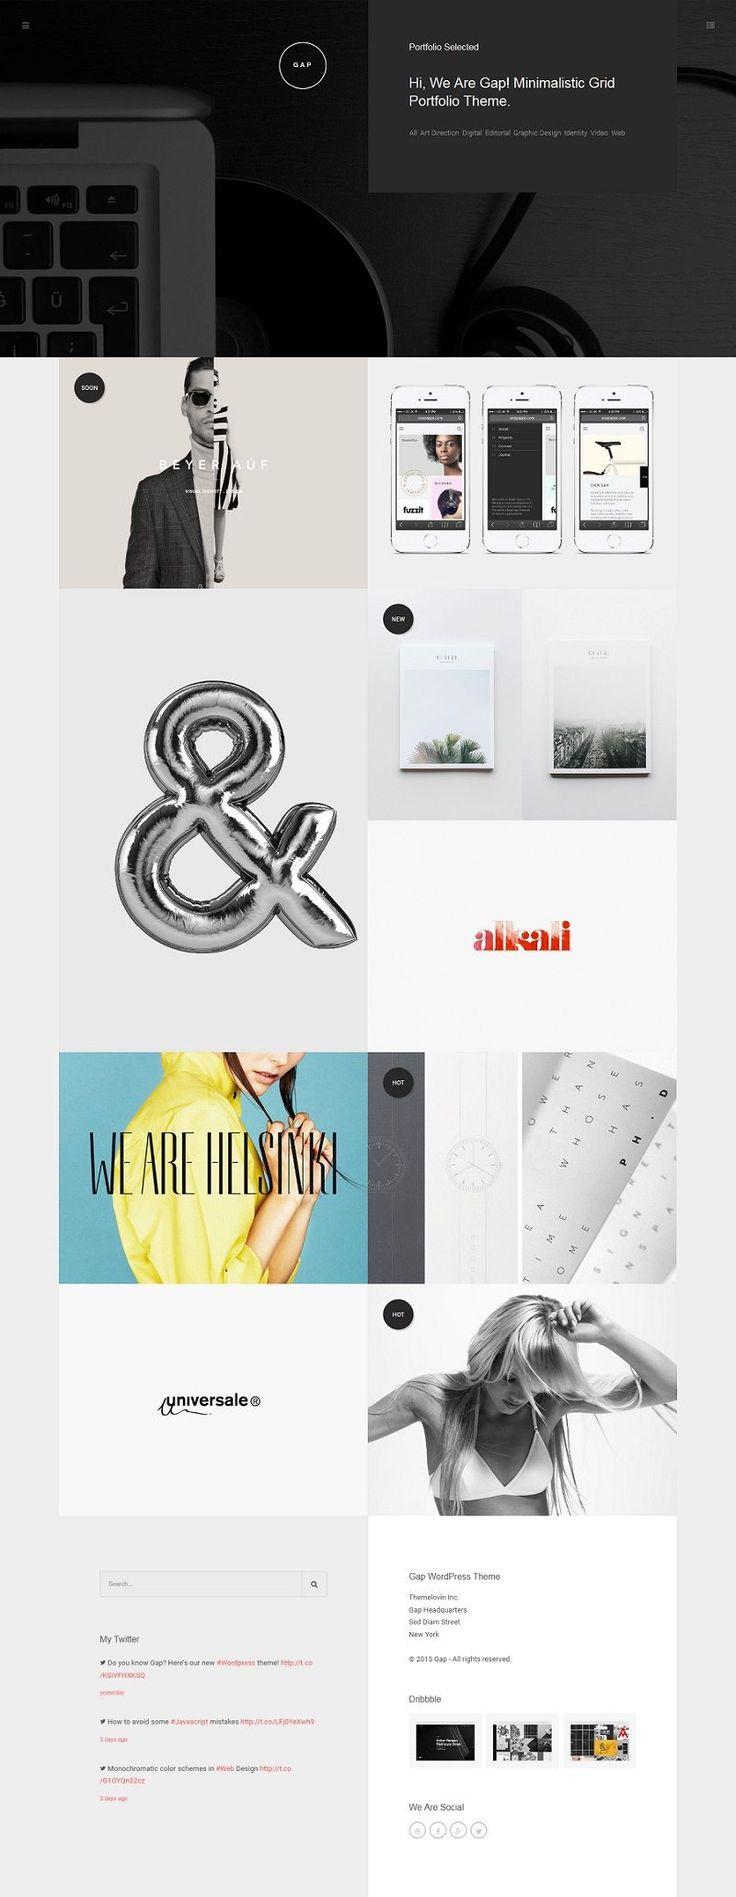 The Most Creative WordPress Themes